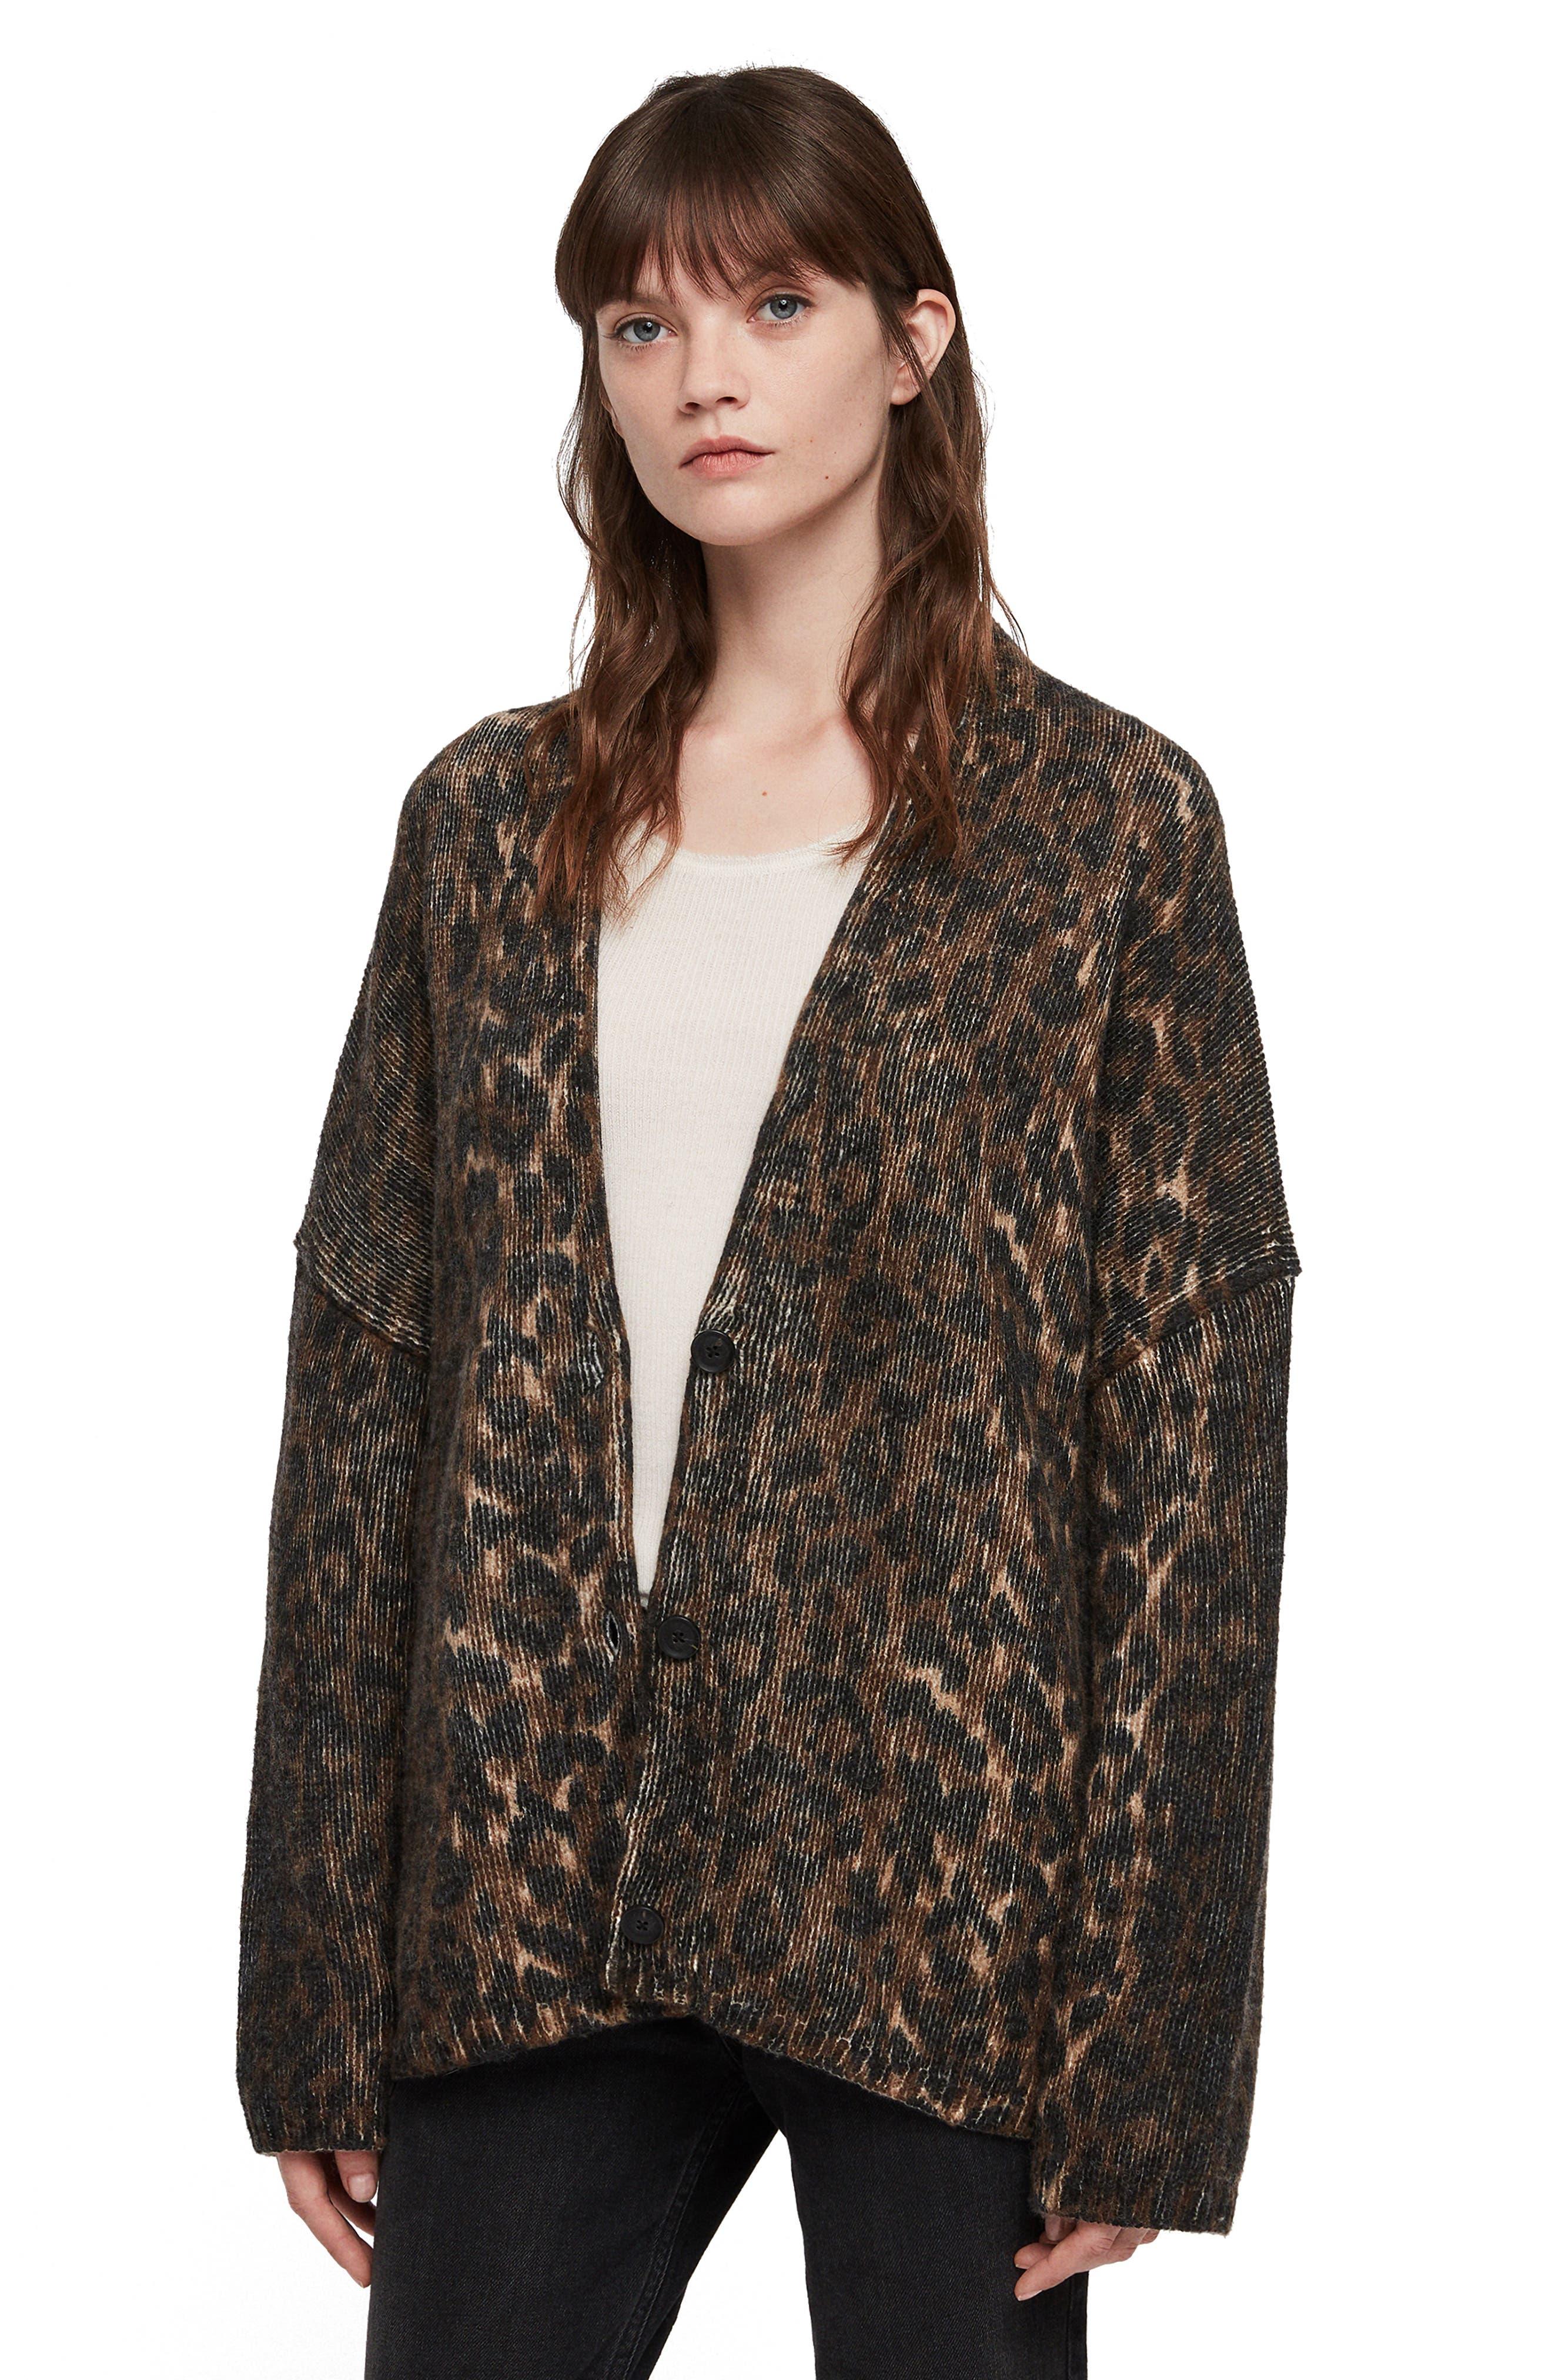 Ph Leopard Wool Blend Cardigan,                             Alternate thumbnail 4, color,                             LEOPARD BROWN